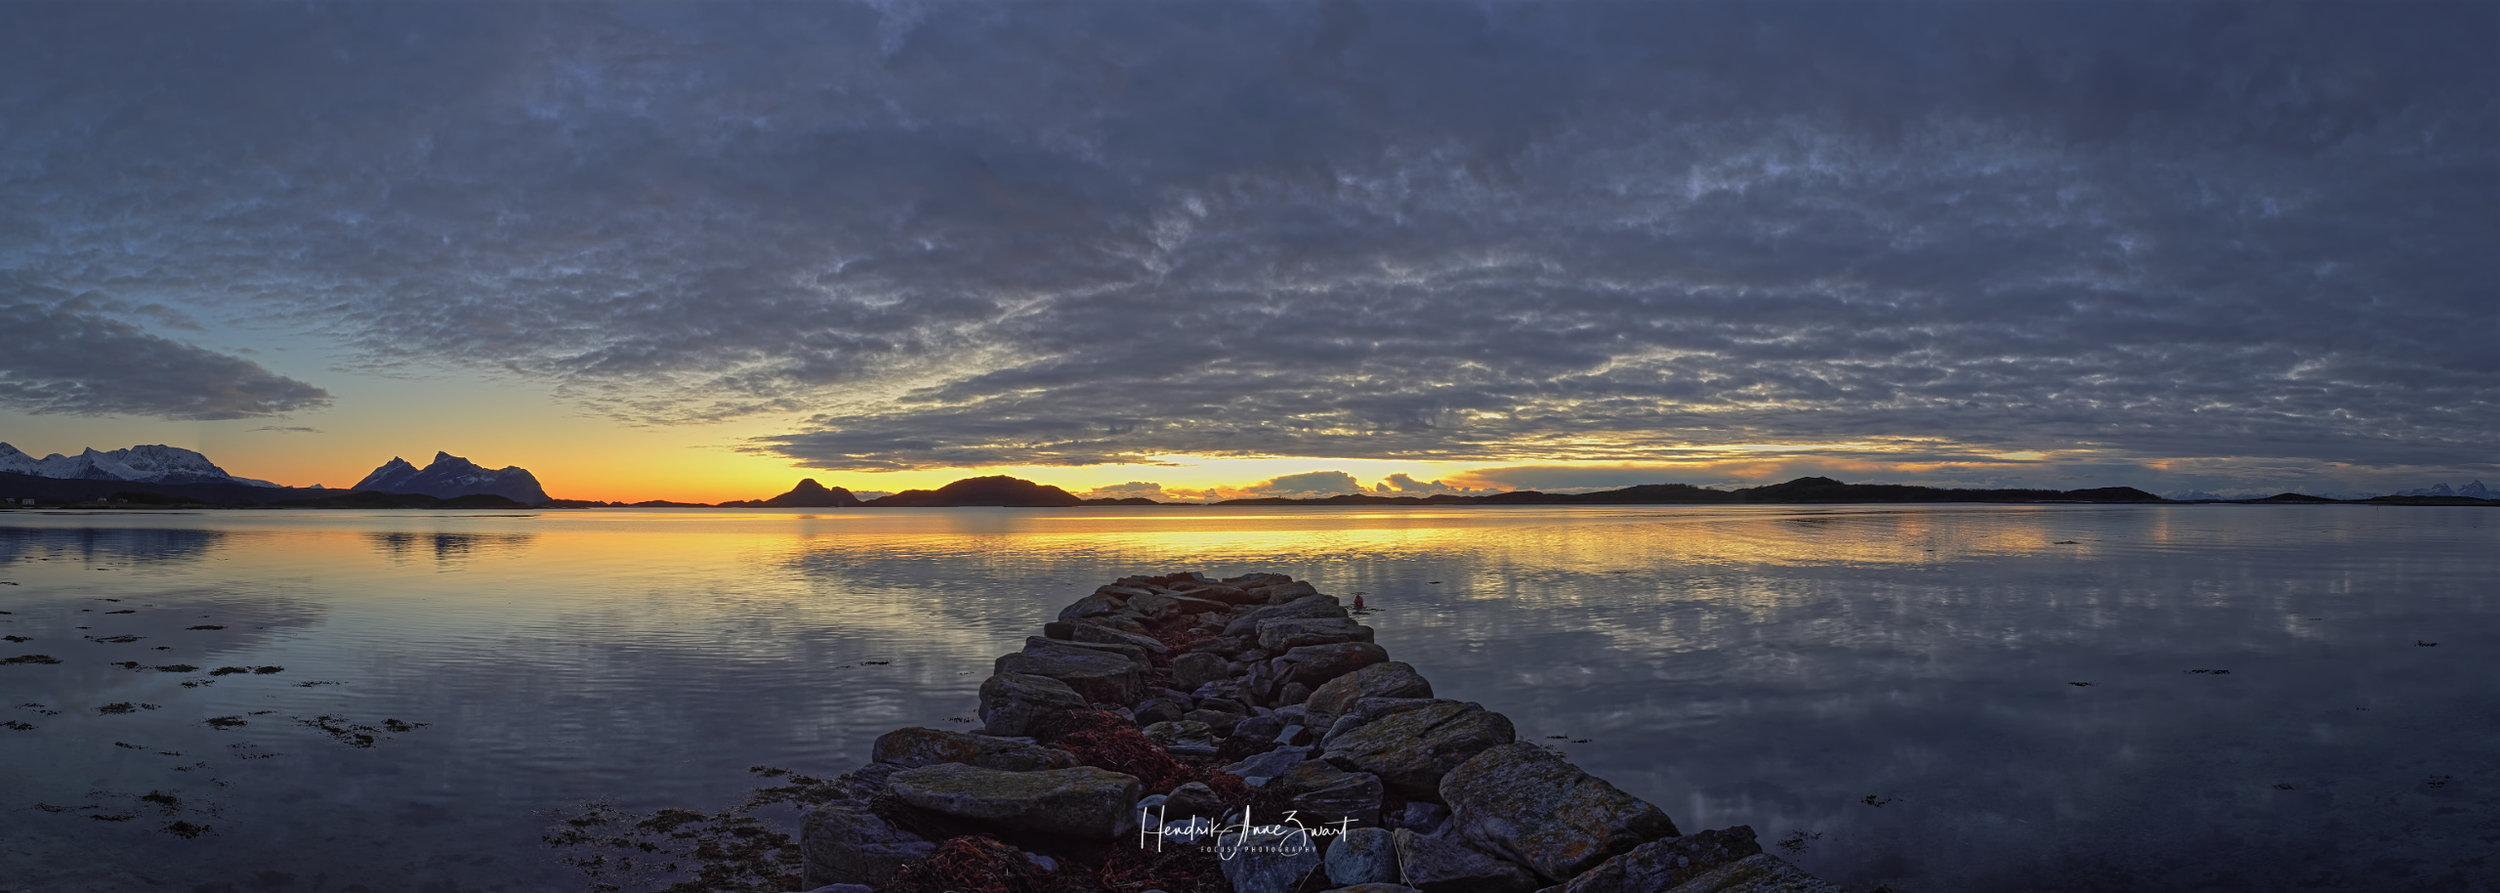 Bø_Sunset_Pier_1.jpg